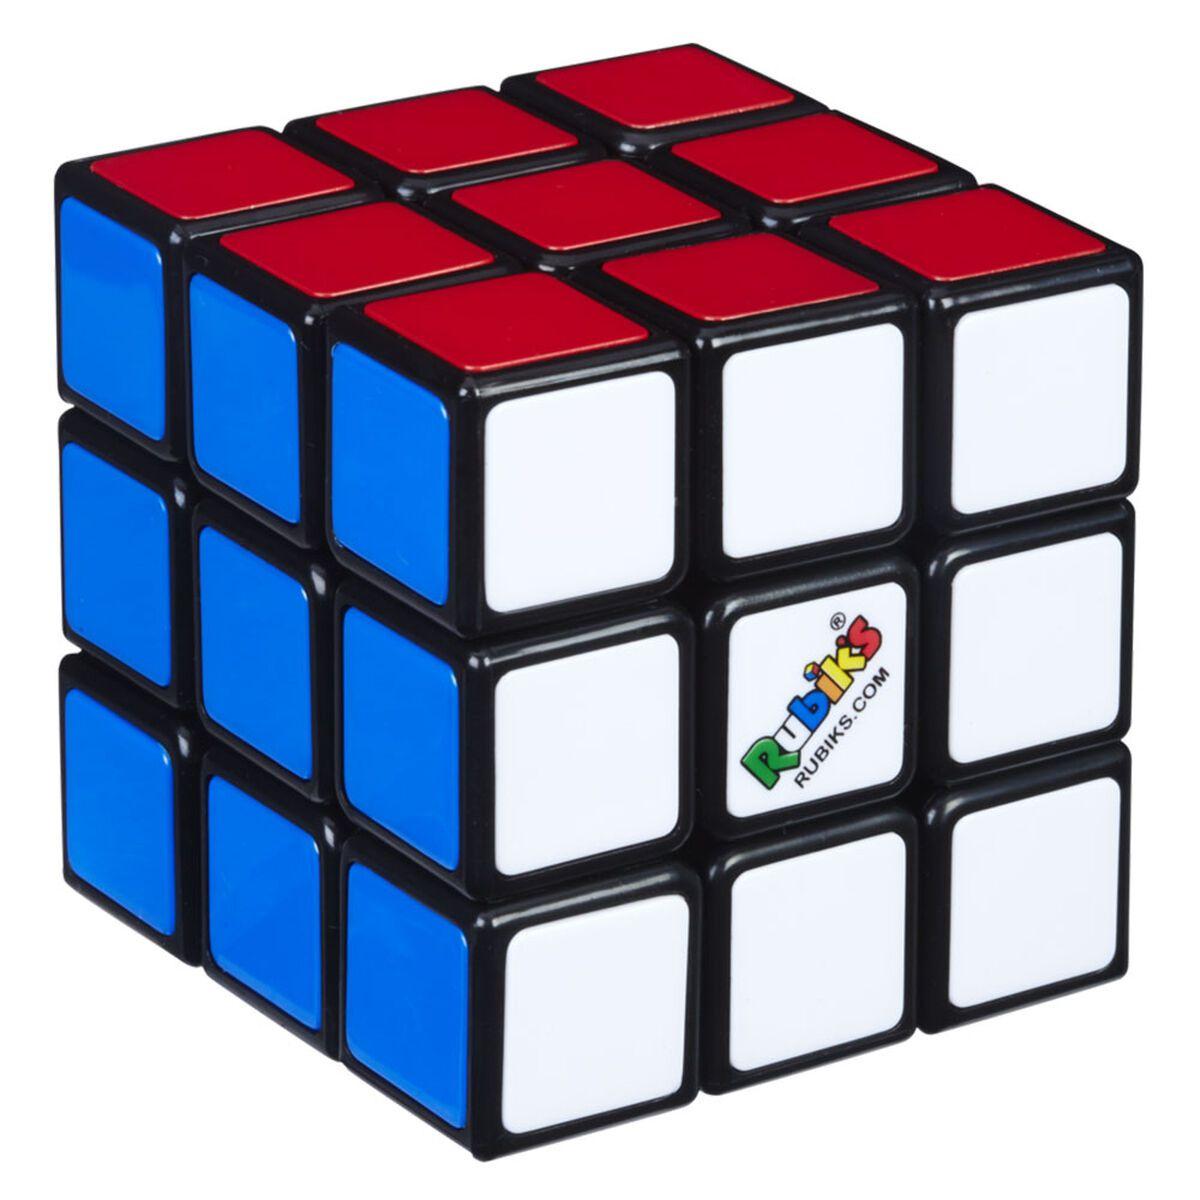 Jogo Cubo Magico Rubik's Cube - Hasbro